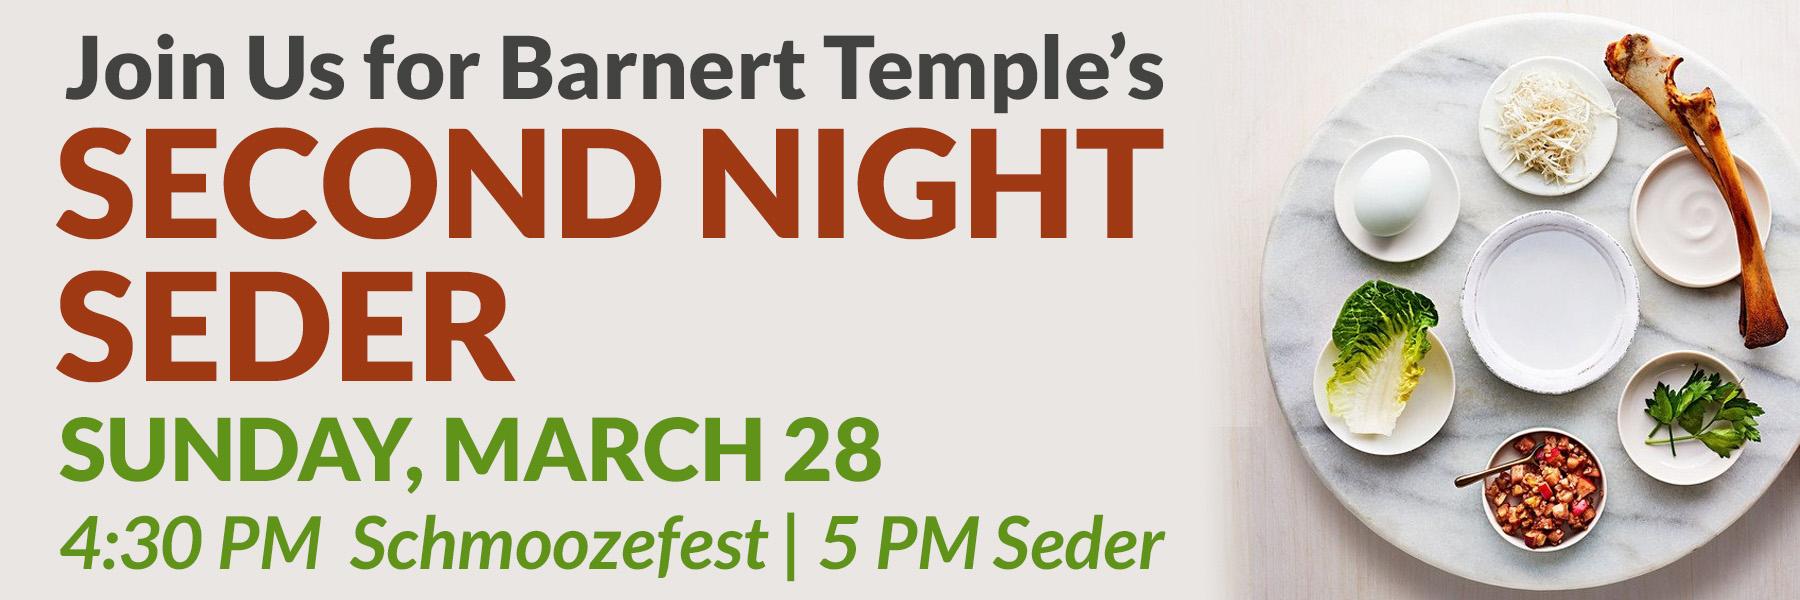 Second Night Seder Banner